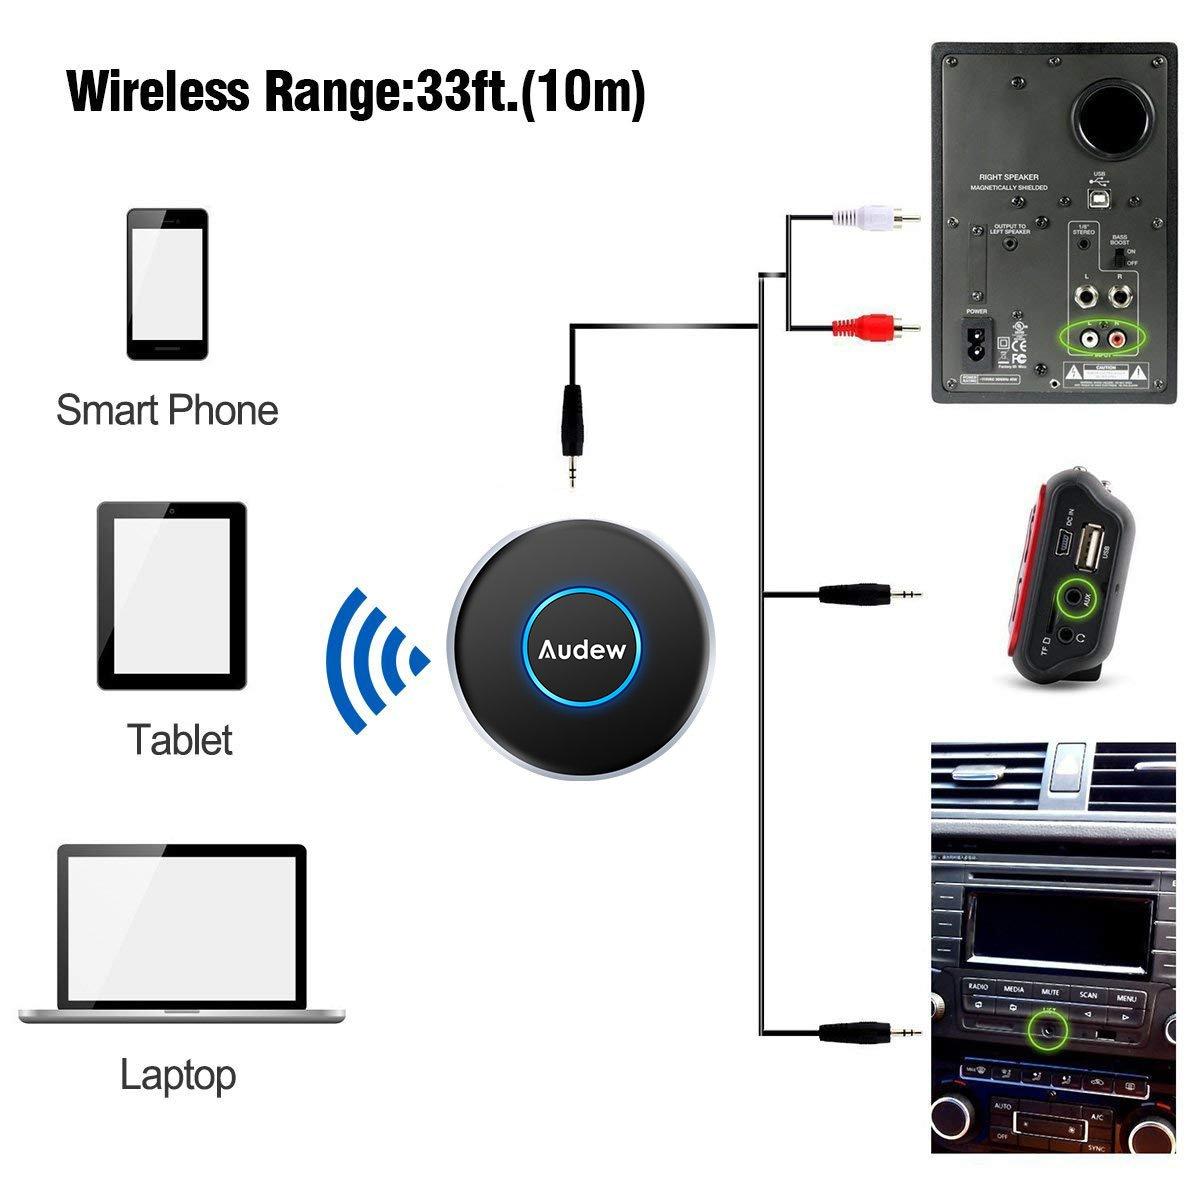 Audew B-luetooth Empf/änger B-luetooth Adapter Transmitter 4.1 Mini Audio Musik Adapter Drahtloser mit Stereo 3.5 mm Aux Input f/ür Handy,Lautsprecher,Auto-Player